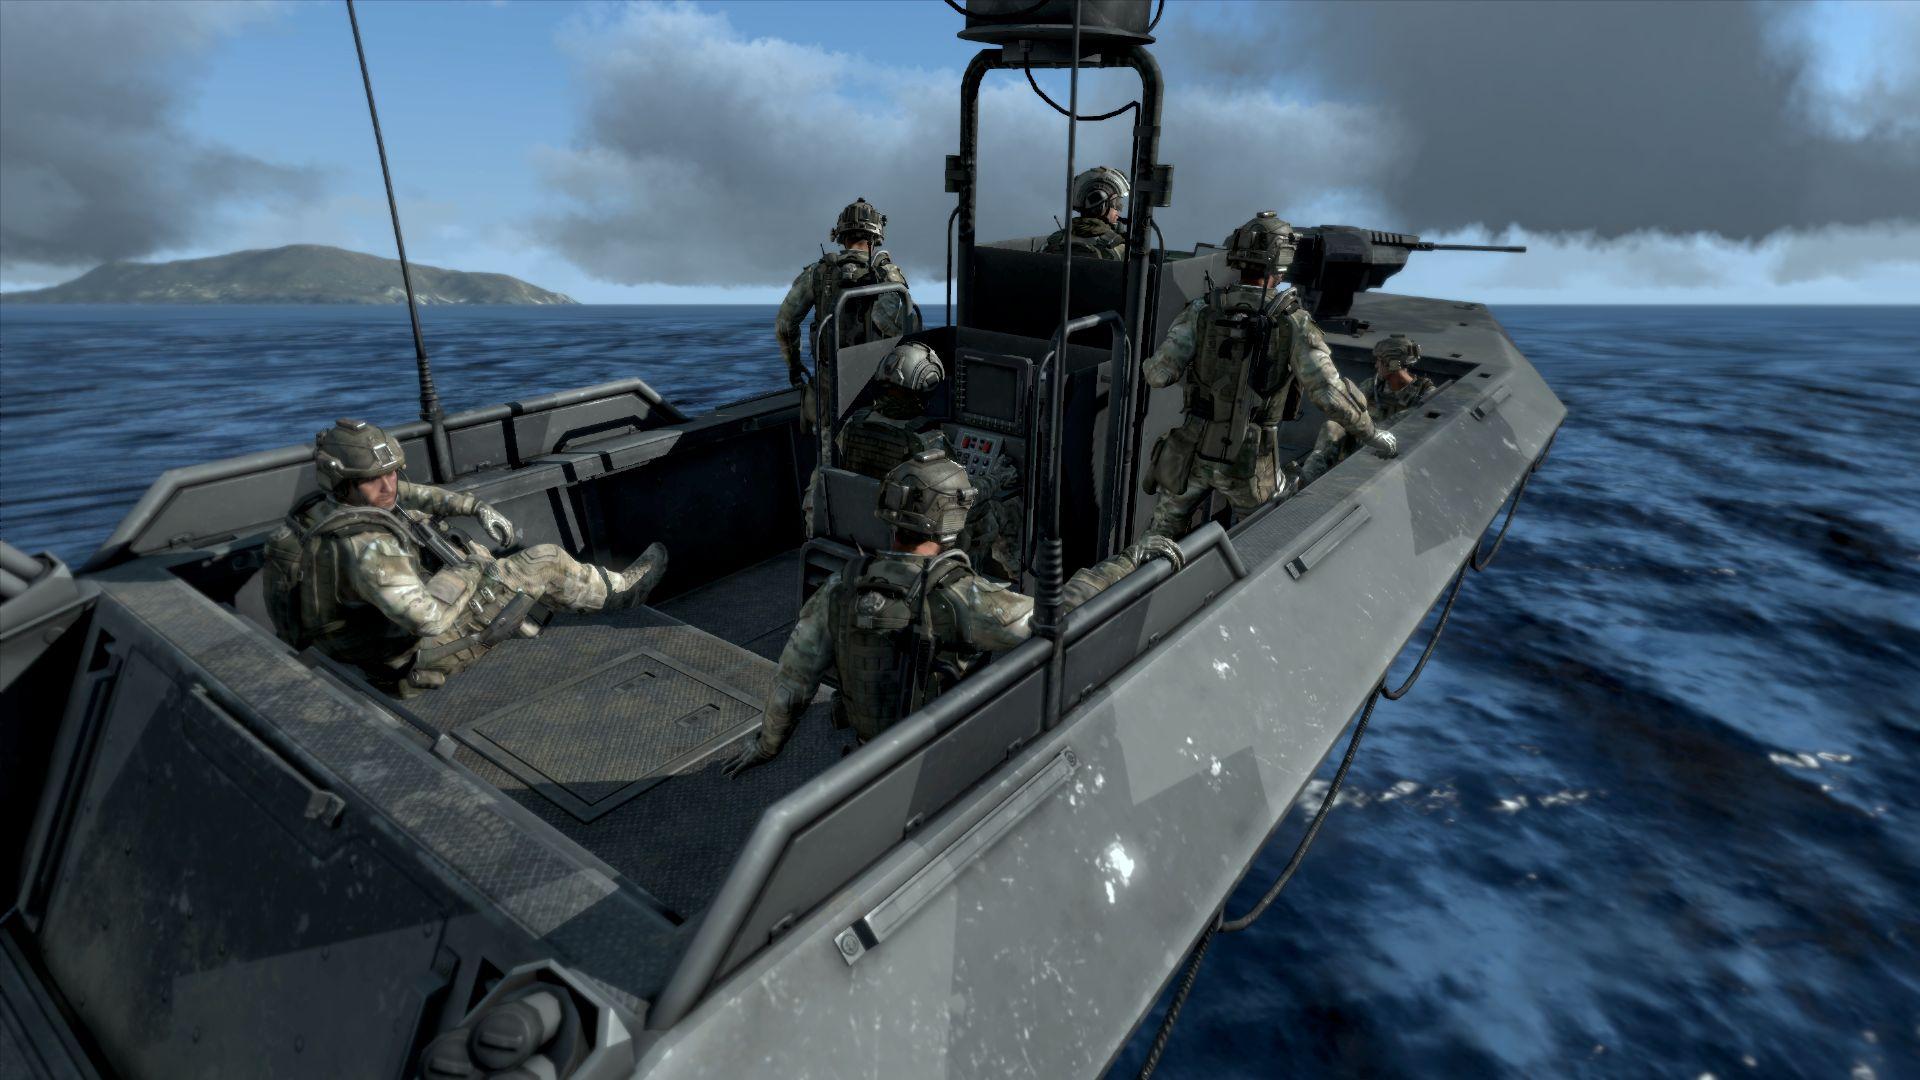 arma3_e3_11_speedboat_01_4.jpg